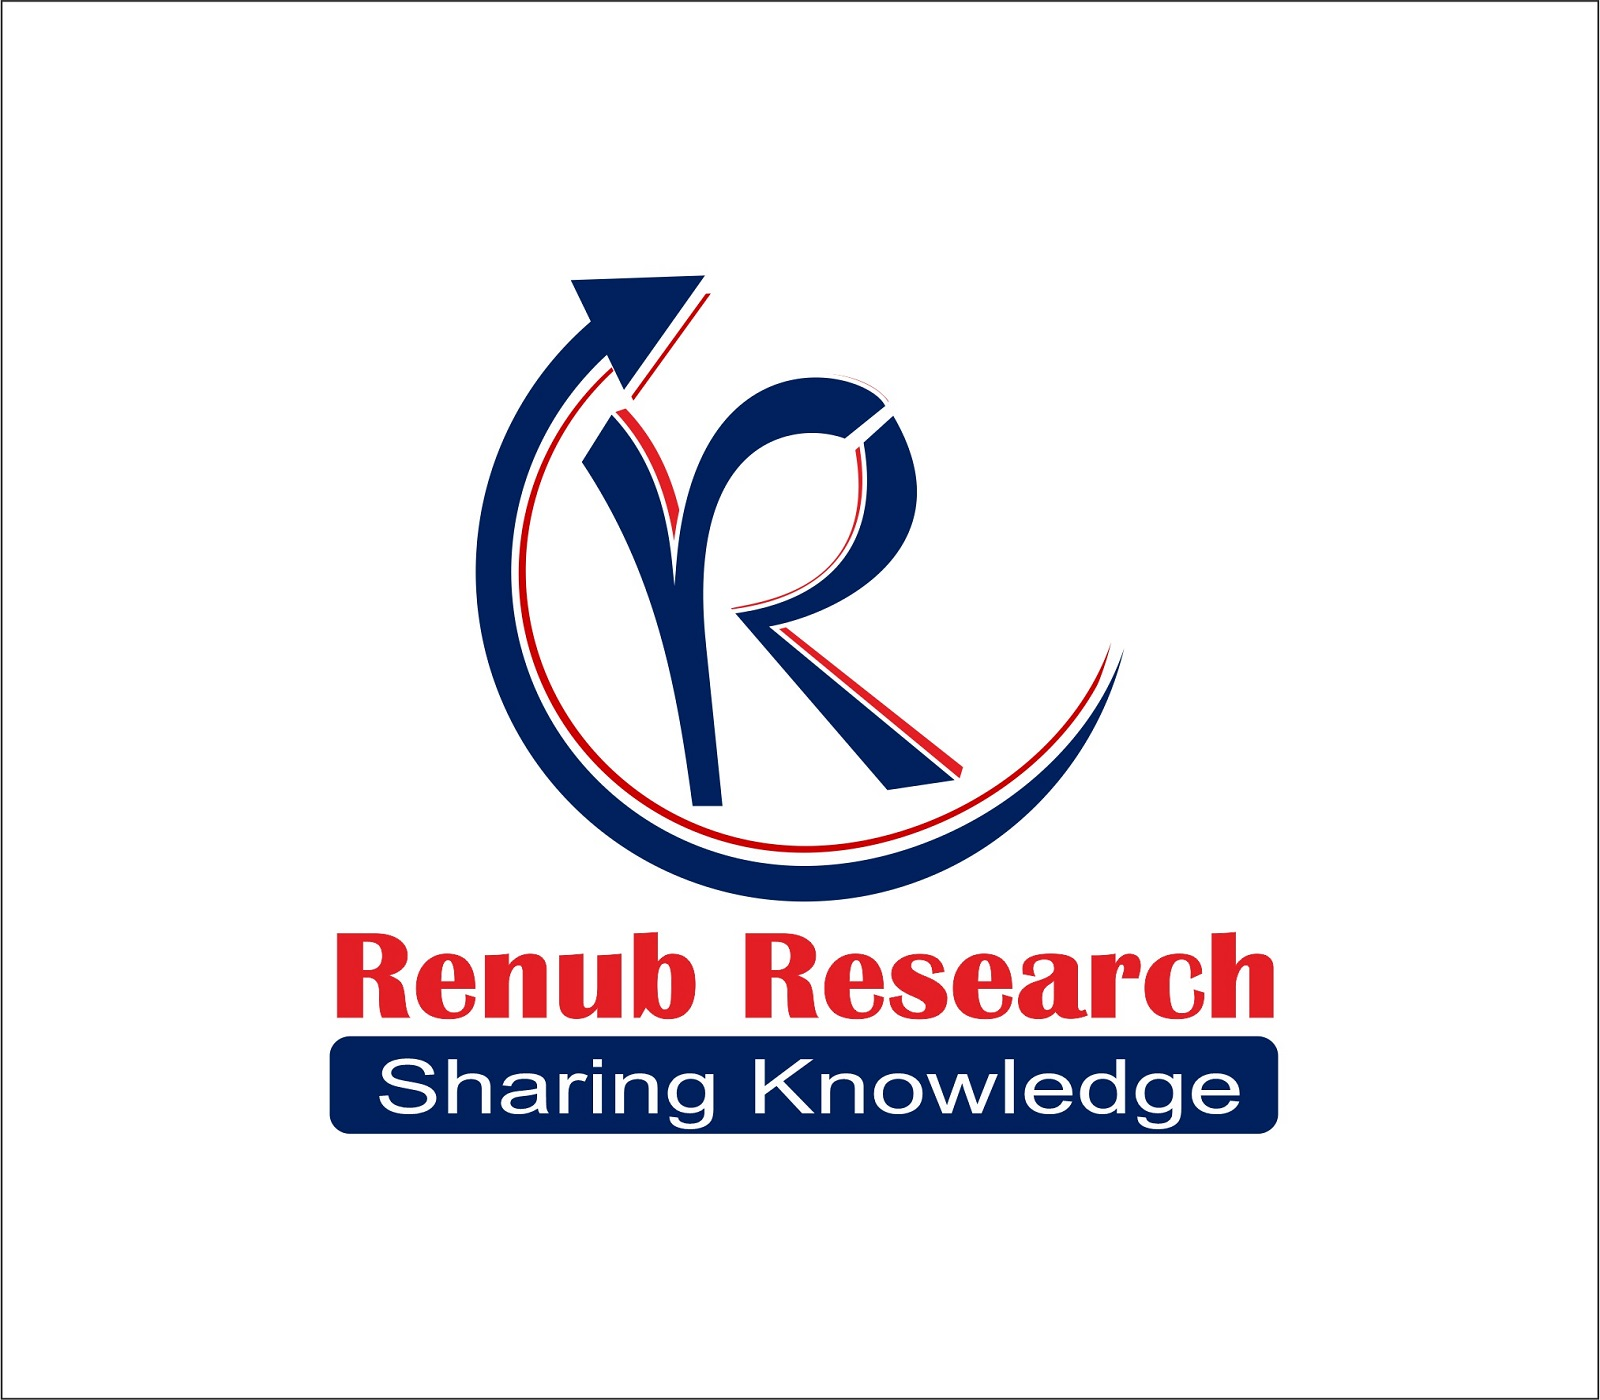 Global CGM Market will be US$ 5.6 Billion by 2025 | Renub Research